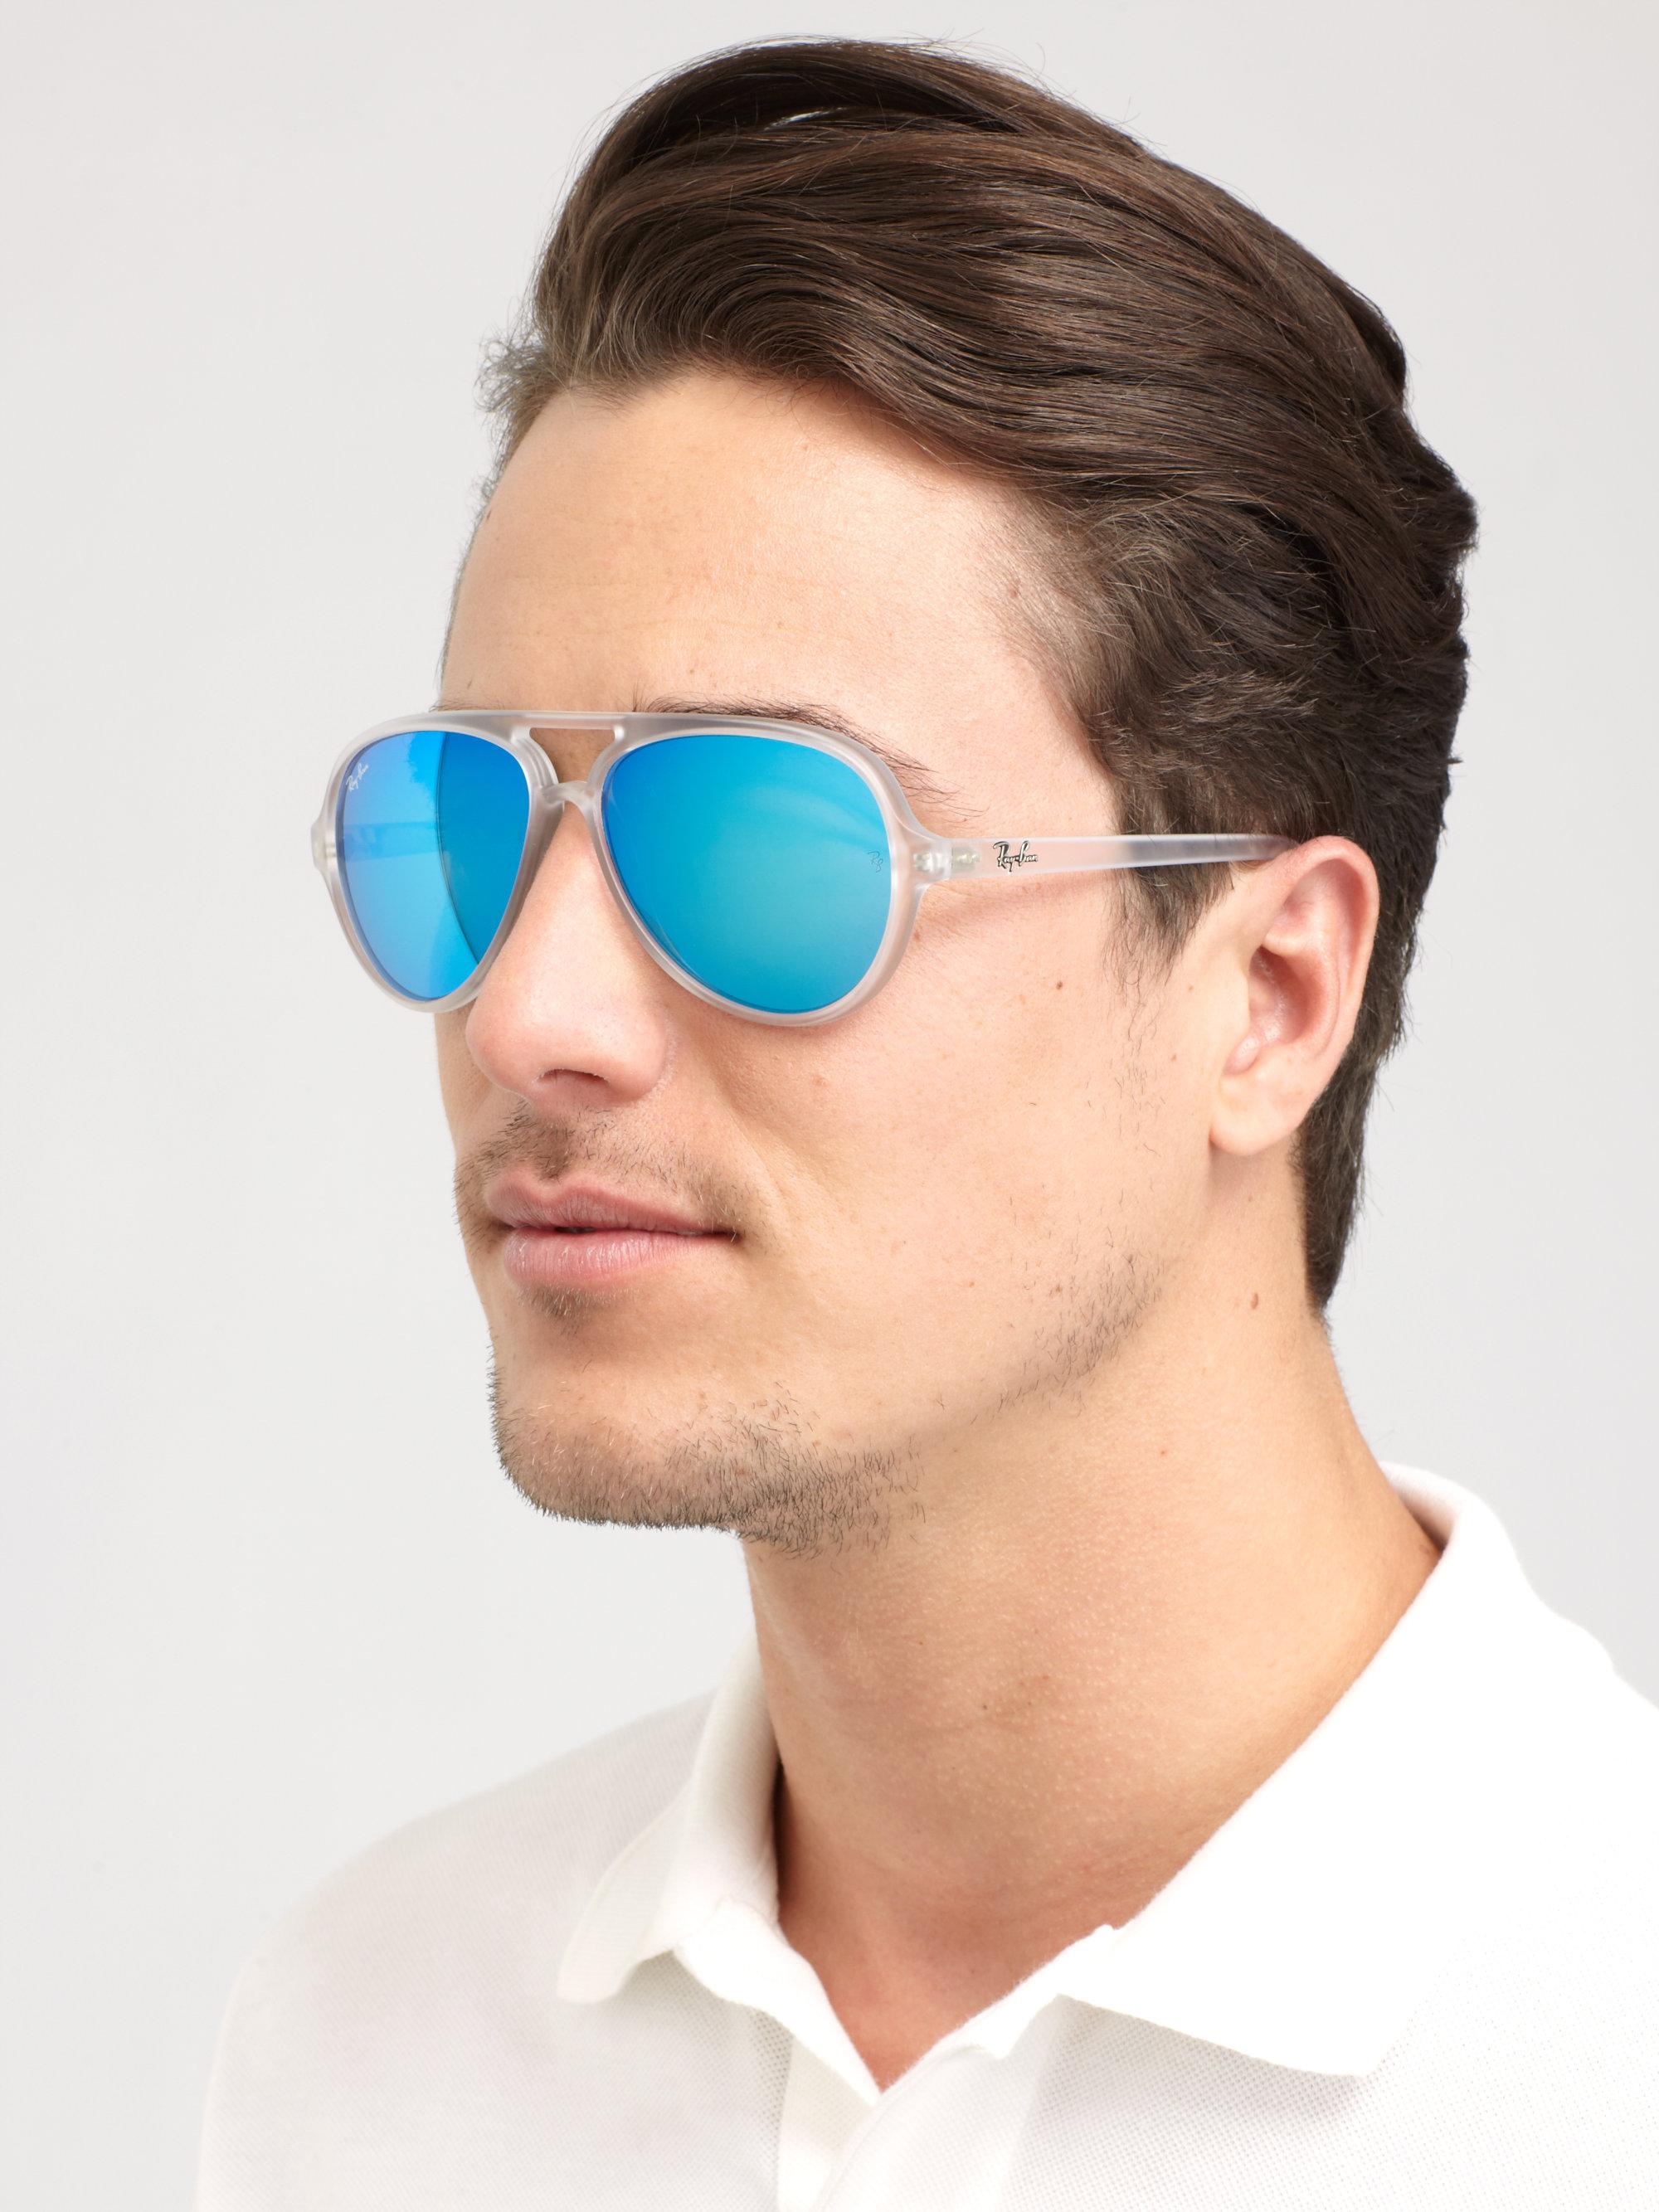 Ray ban aviator blue mirror men for Ray ban aviator verre miroir